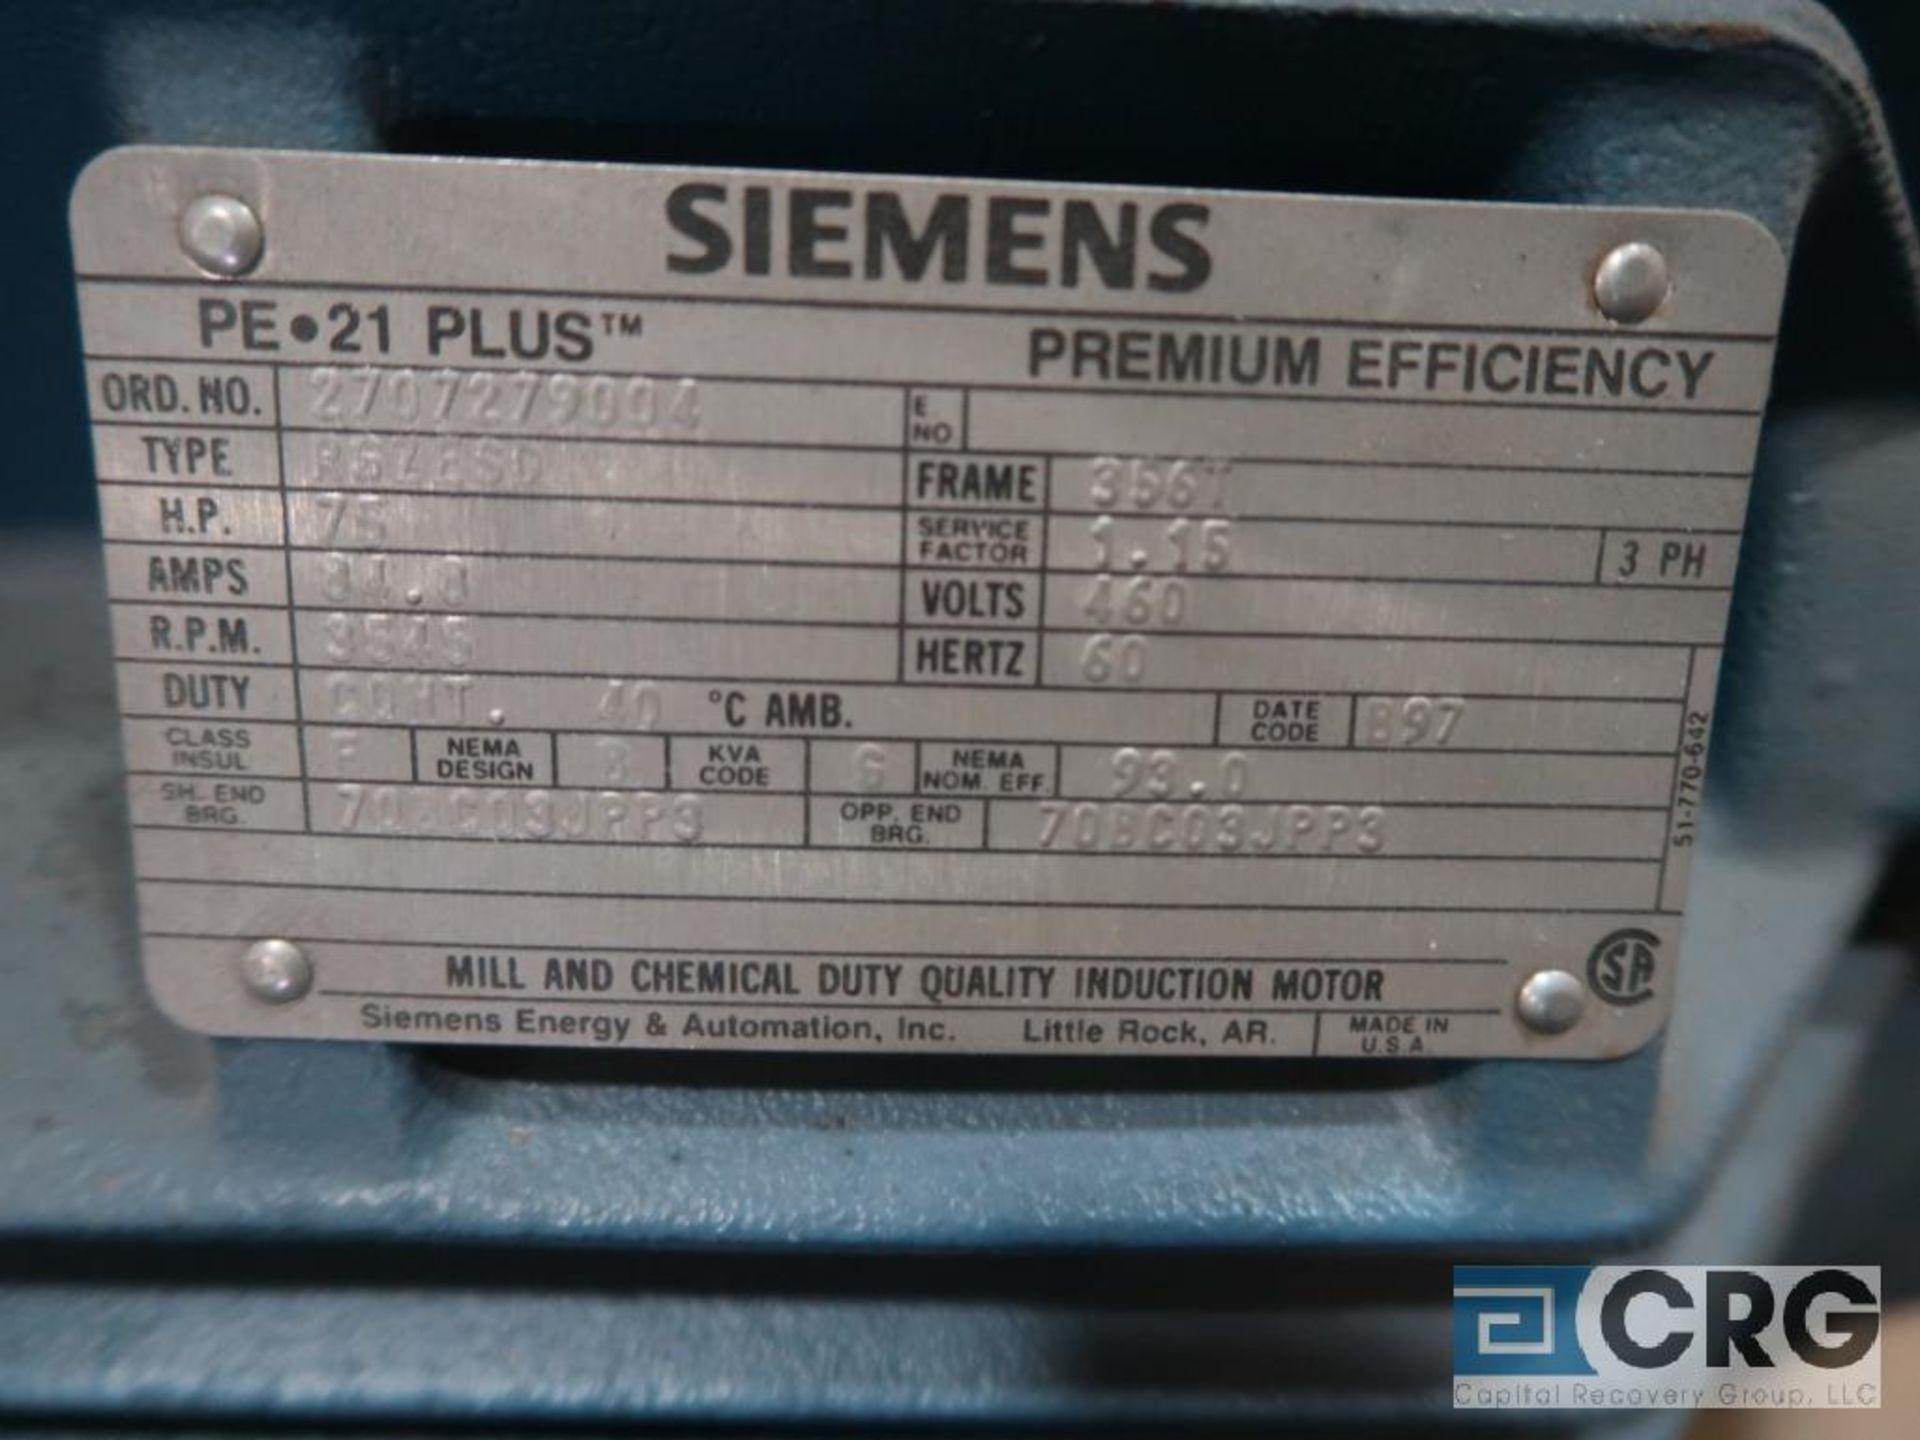 Siemens PE-21 PLUS motor, 75 HP, 3,545 RPMs, 460 volt, 3 ph., 356T frame (Finish Building) - Image 2 of 2